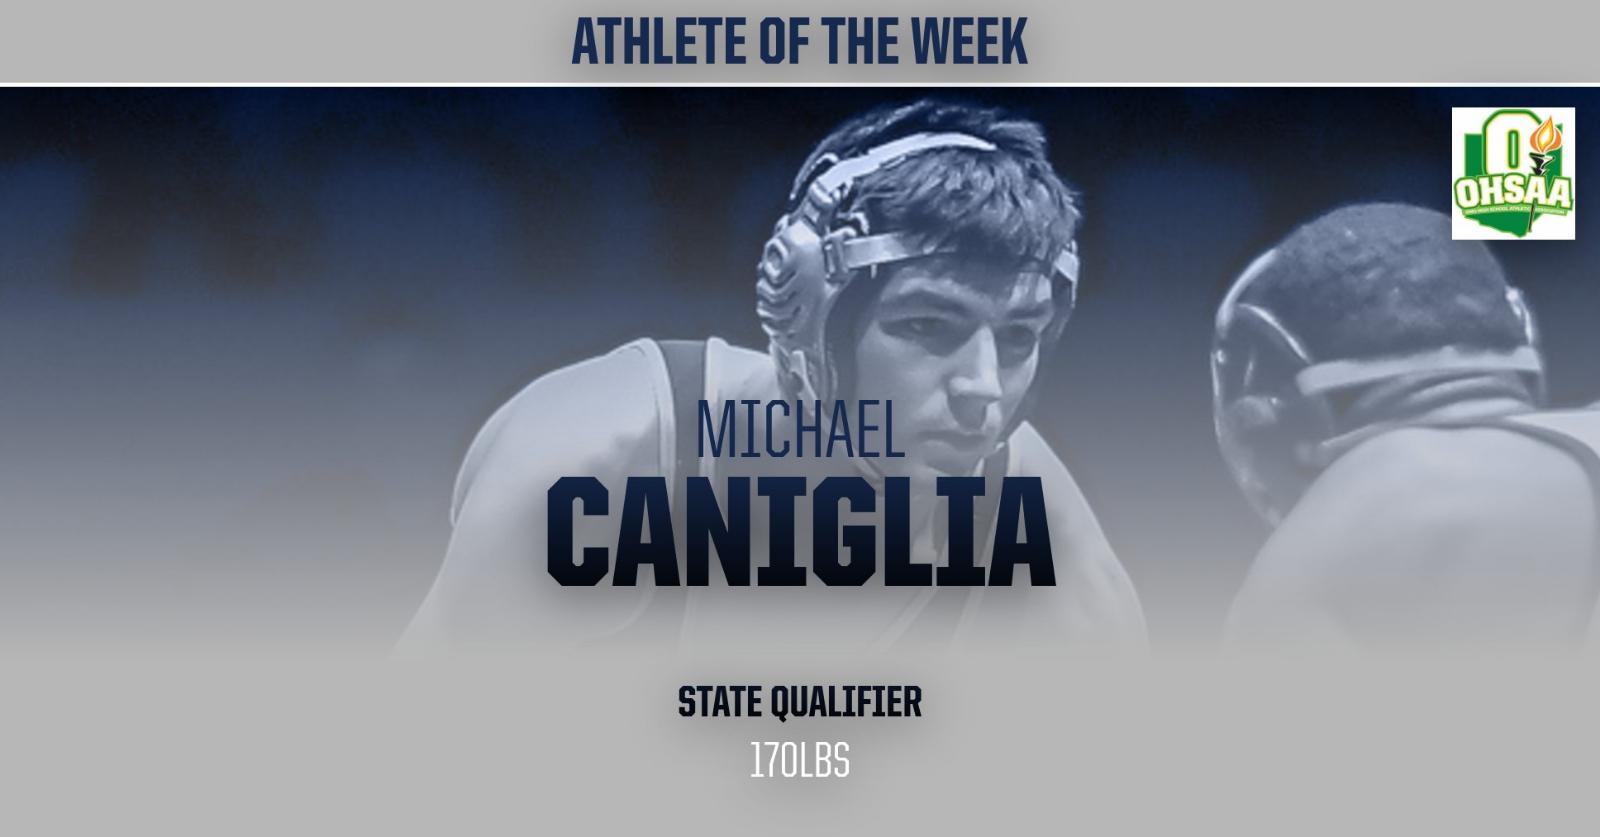 Michael Cangilia – Athlete of the Week